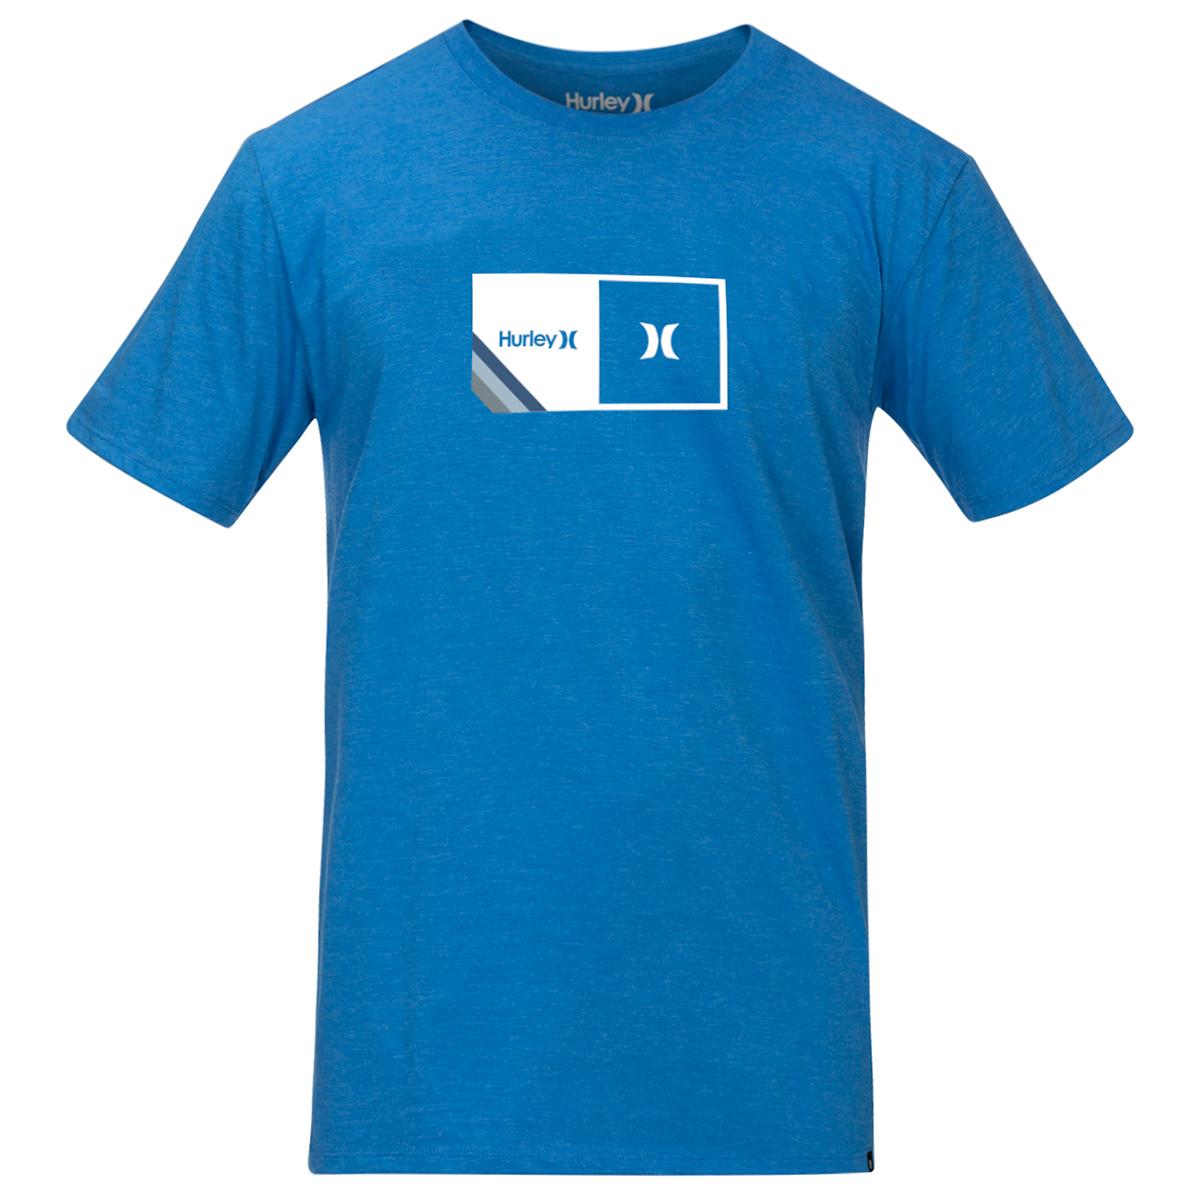 Hurley Men's Short-Sleeve Halfer Stripe Tee - Blue, S